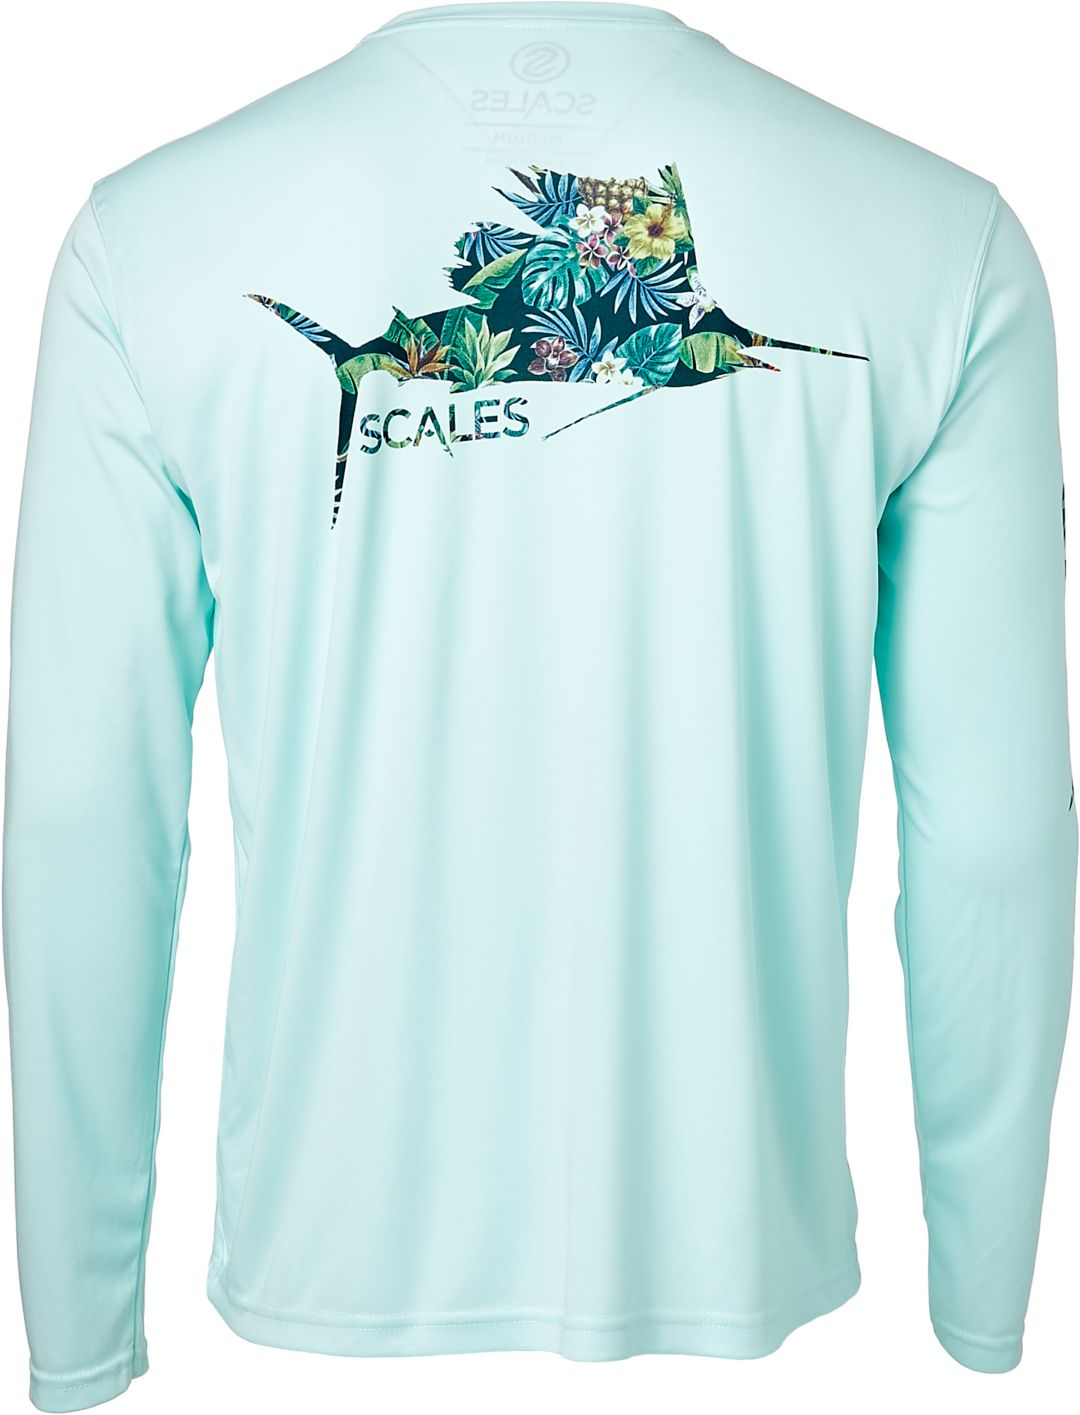 a905b09e Scales Gear Men's Tropical Sail Performance Long Sleeve Shirt